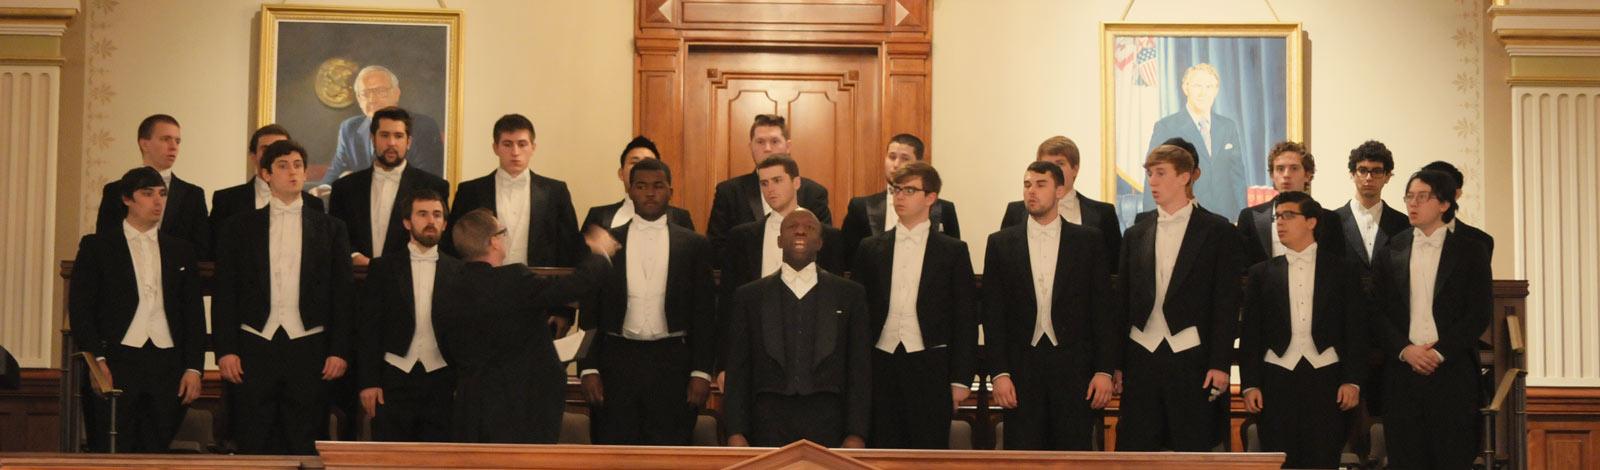 choir-back